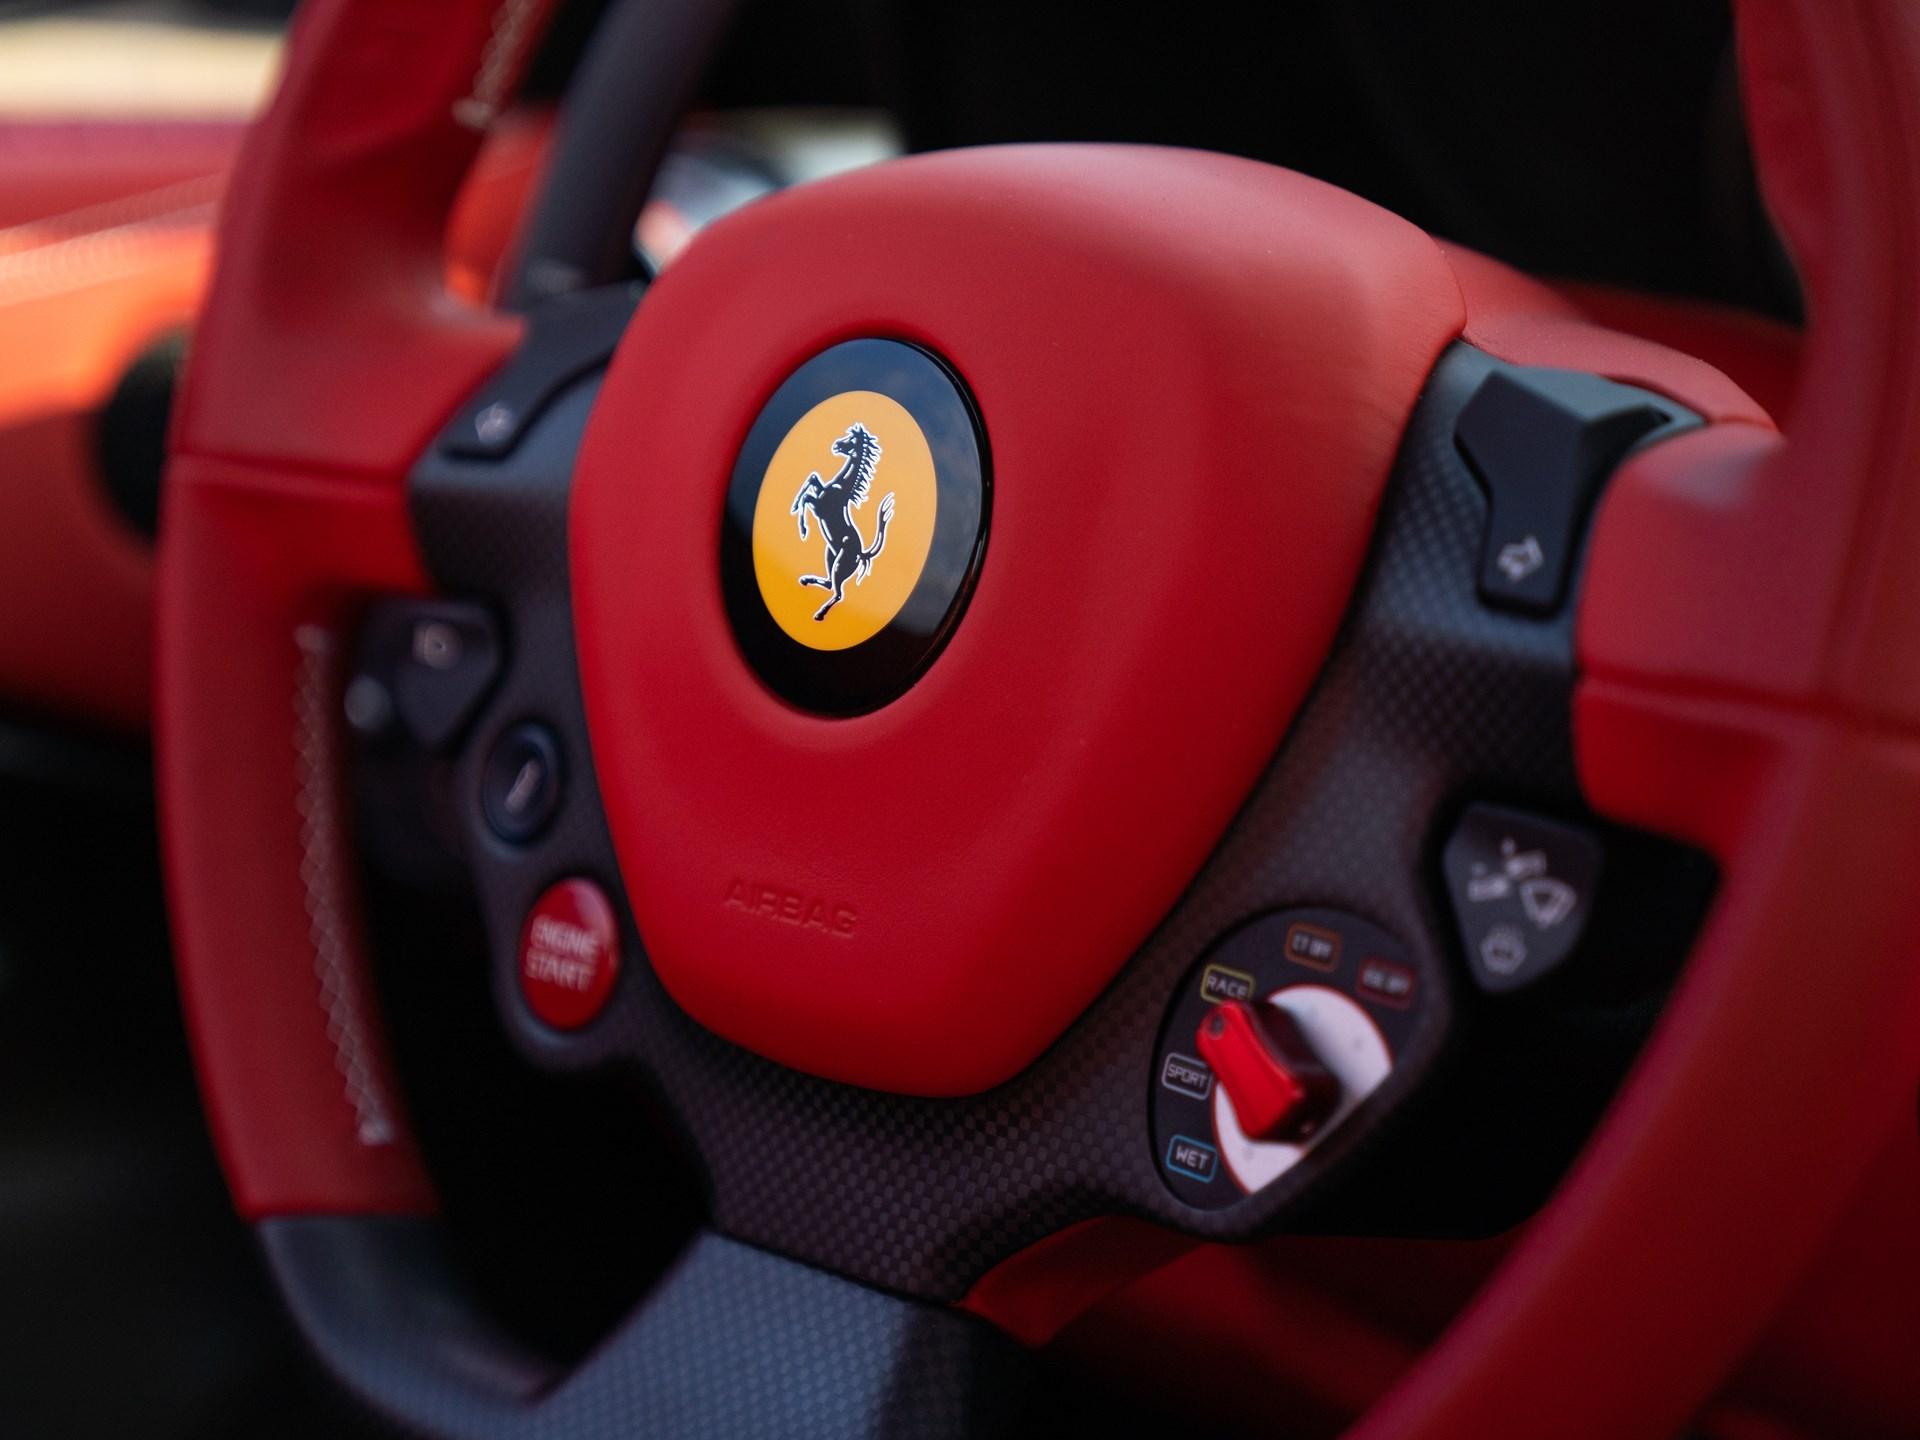 2017 Ferrari F12tdf steering wheel